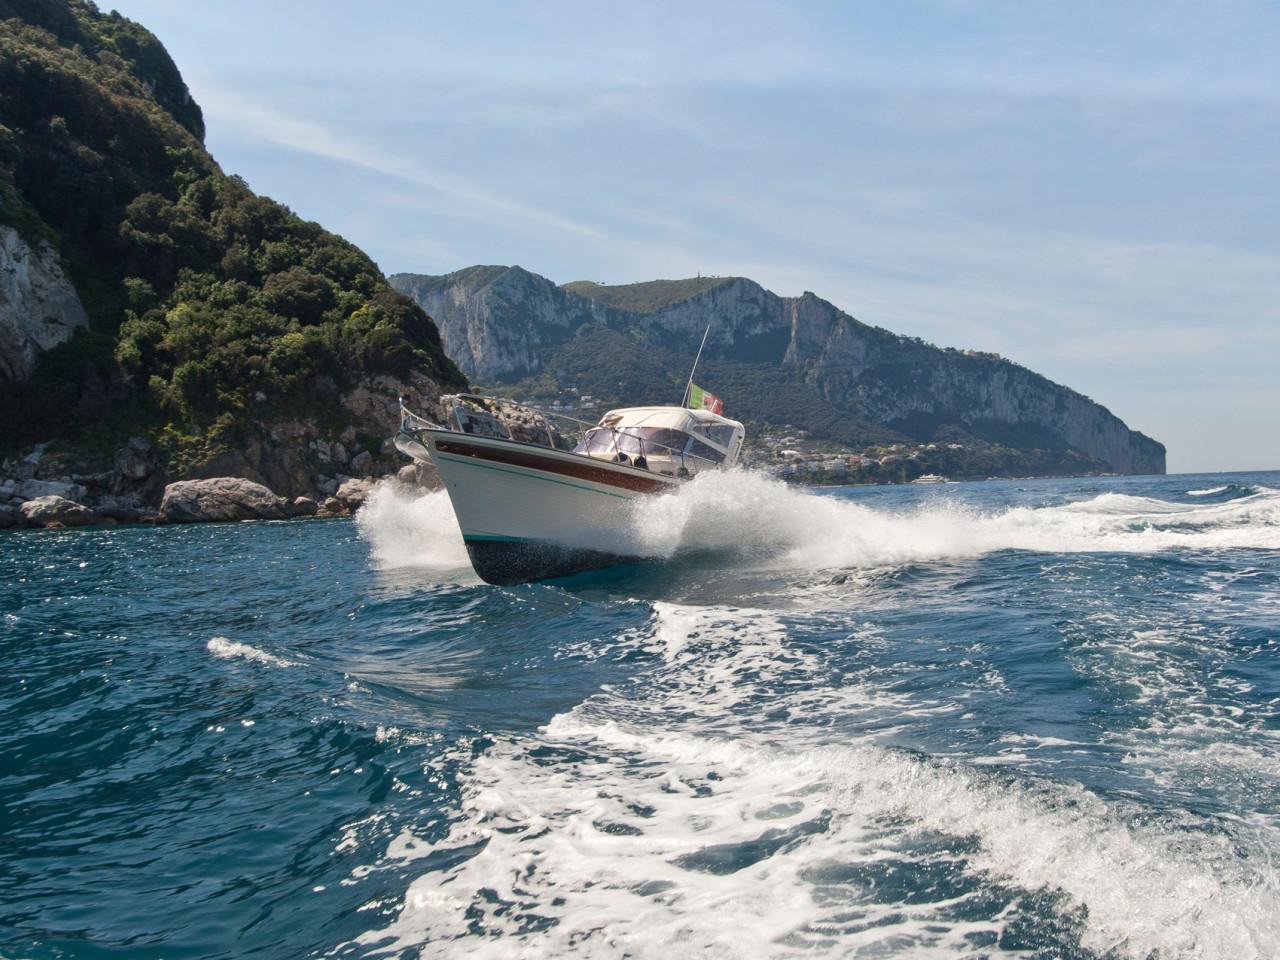 Filì - Aprea 32 | Amalfi Coast private gozzo rental